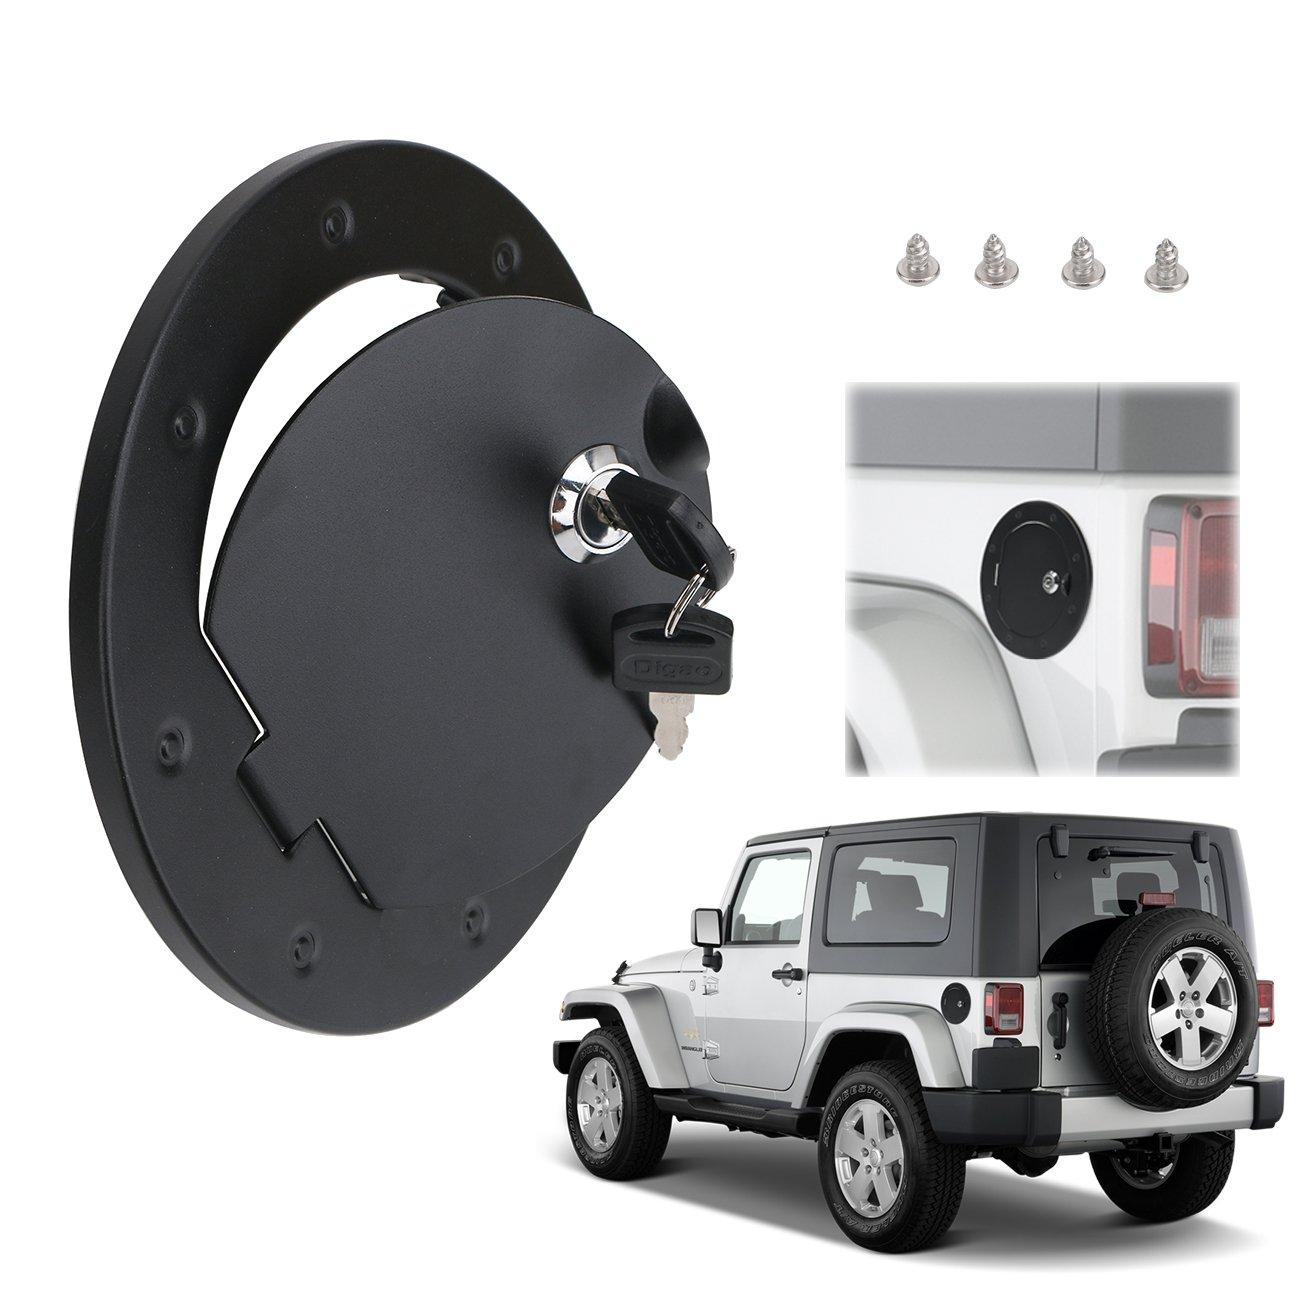 Fuel Tank Cover for Jeep JK Wrangler , BOXATDOOR Gas Tank Cap with Lock Aluminum Alloy Black anti-corrosion finish for 2007-2017 Jeep Wrangler JK 2/4 Door